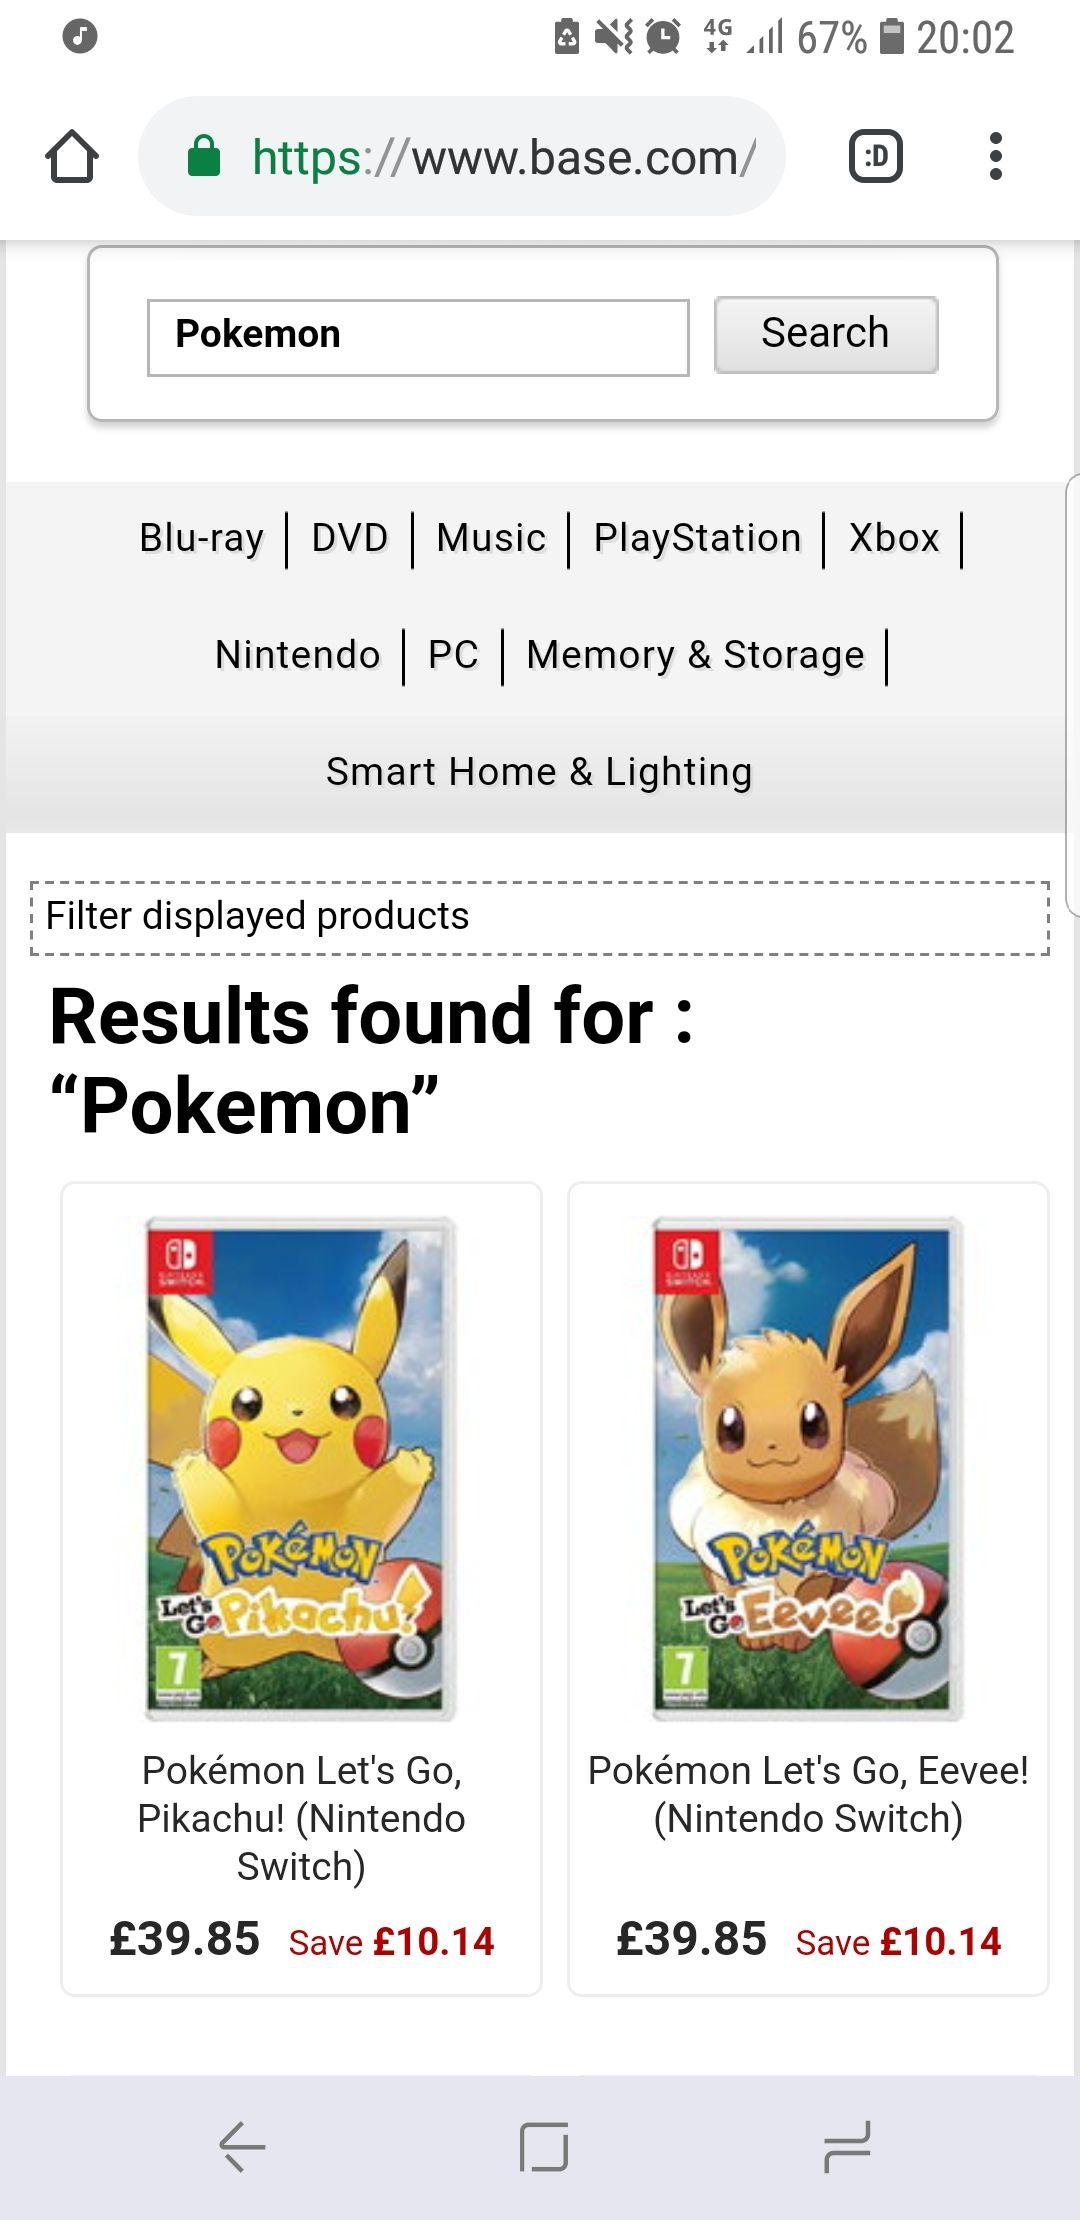 Pokemon let's go eevee and pikachu £39.85 @ Base.com